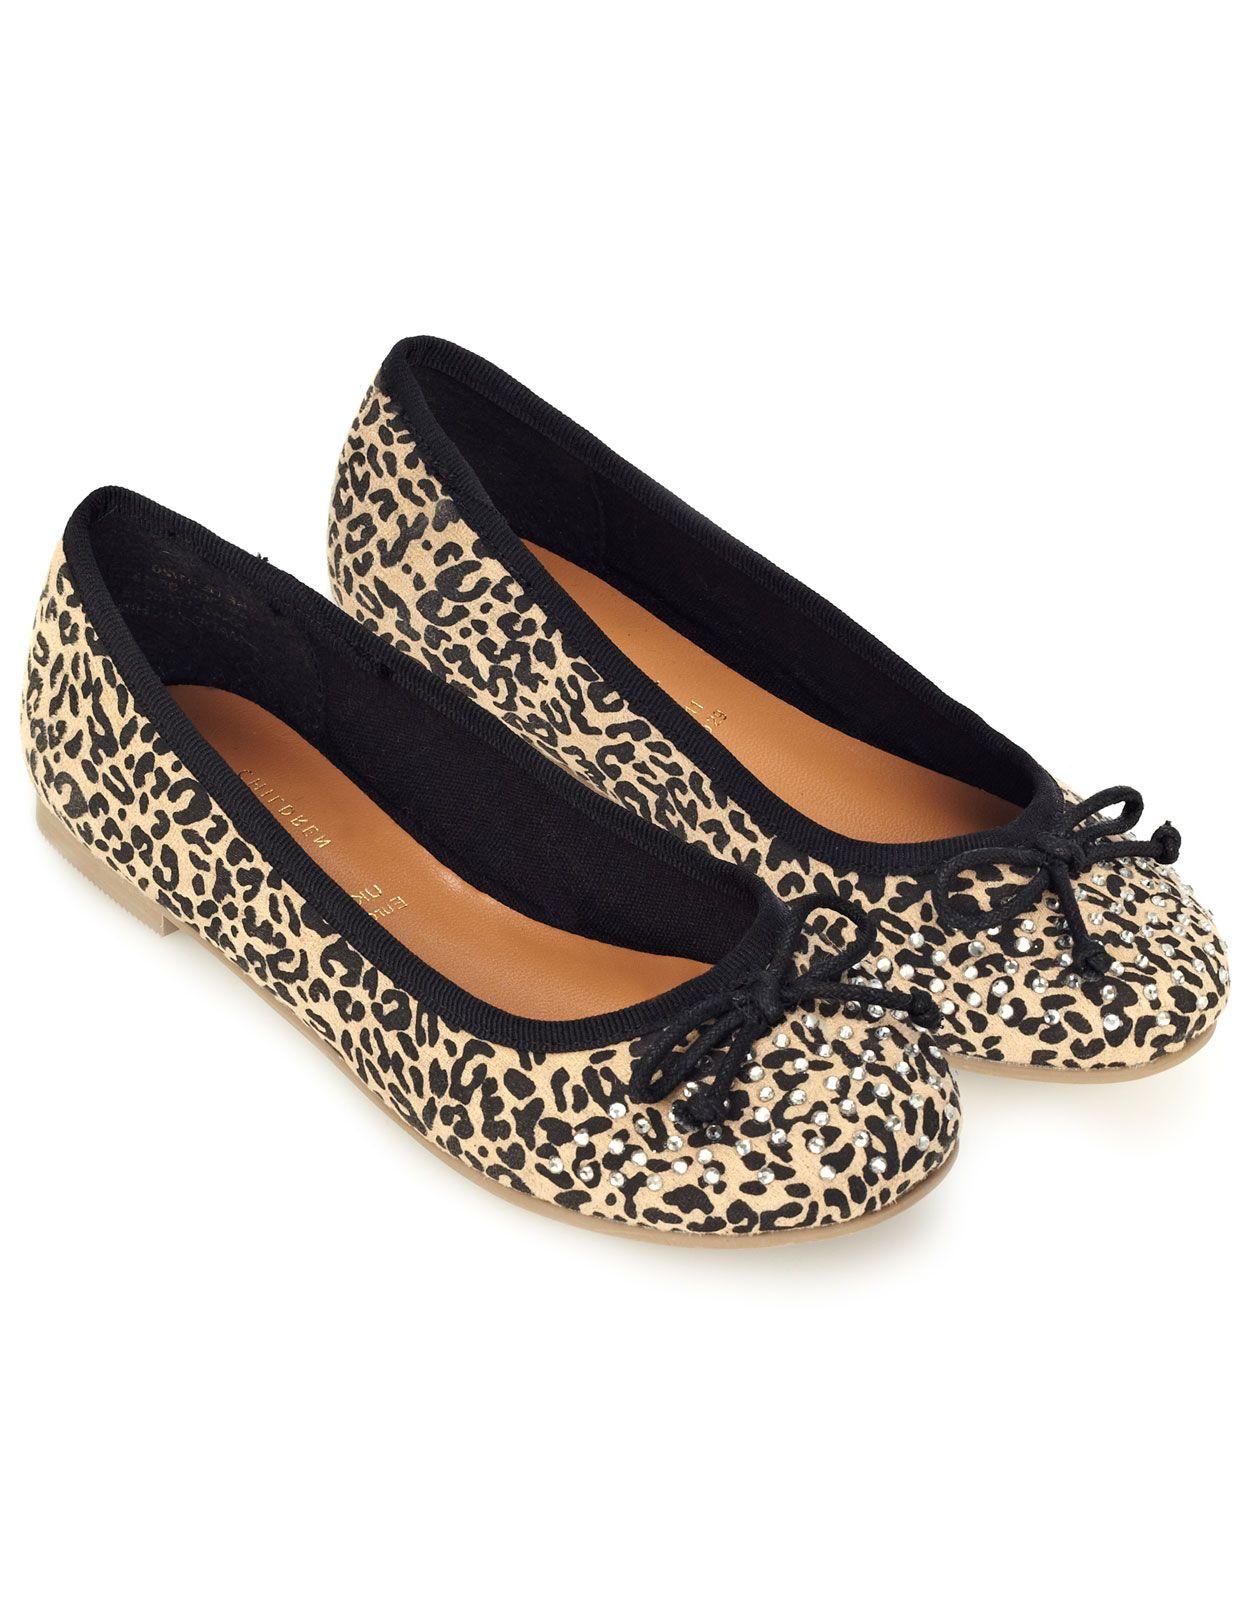 Heat Fix Leopard Print Bow Ballerina   Brown   Monsoon